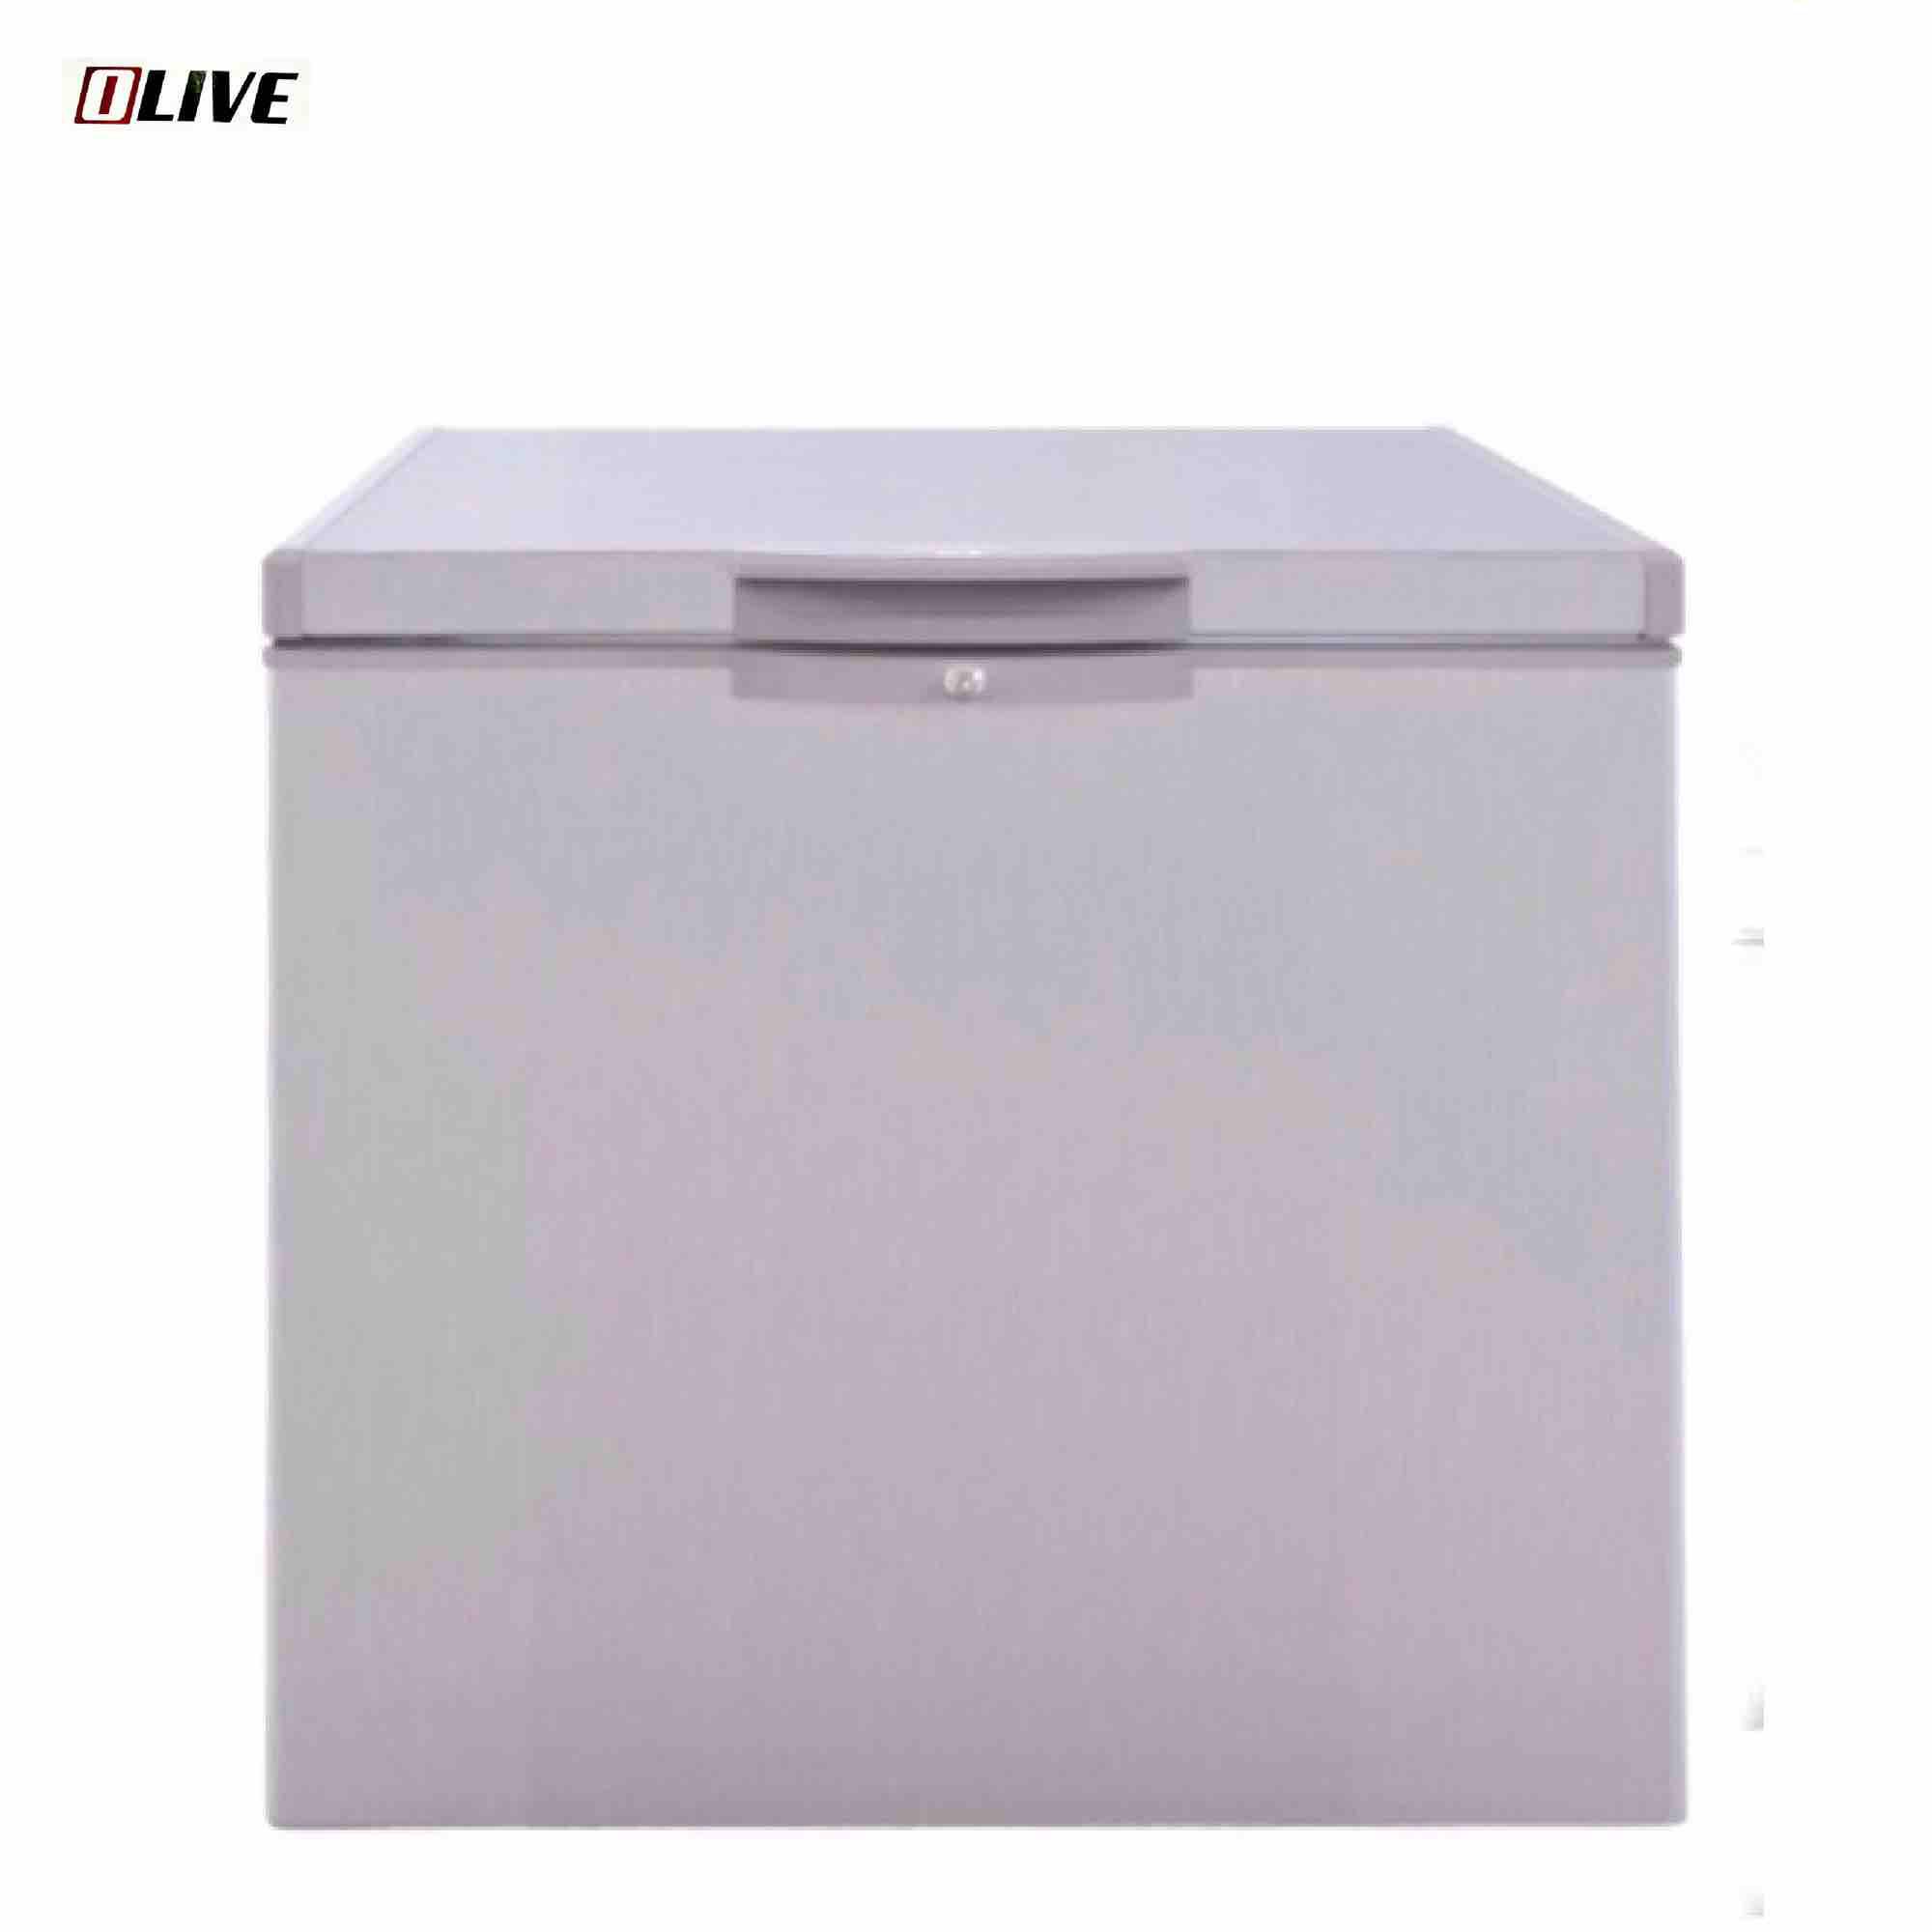 OLIVE Chest Freezer 550 Ltr-OL-550